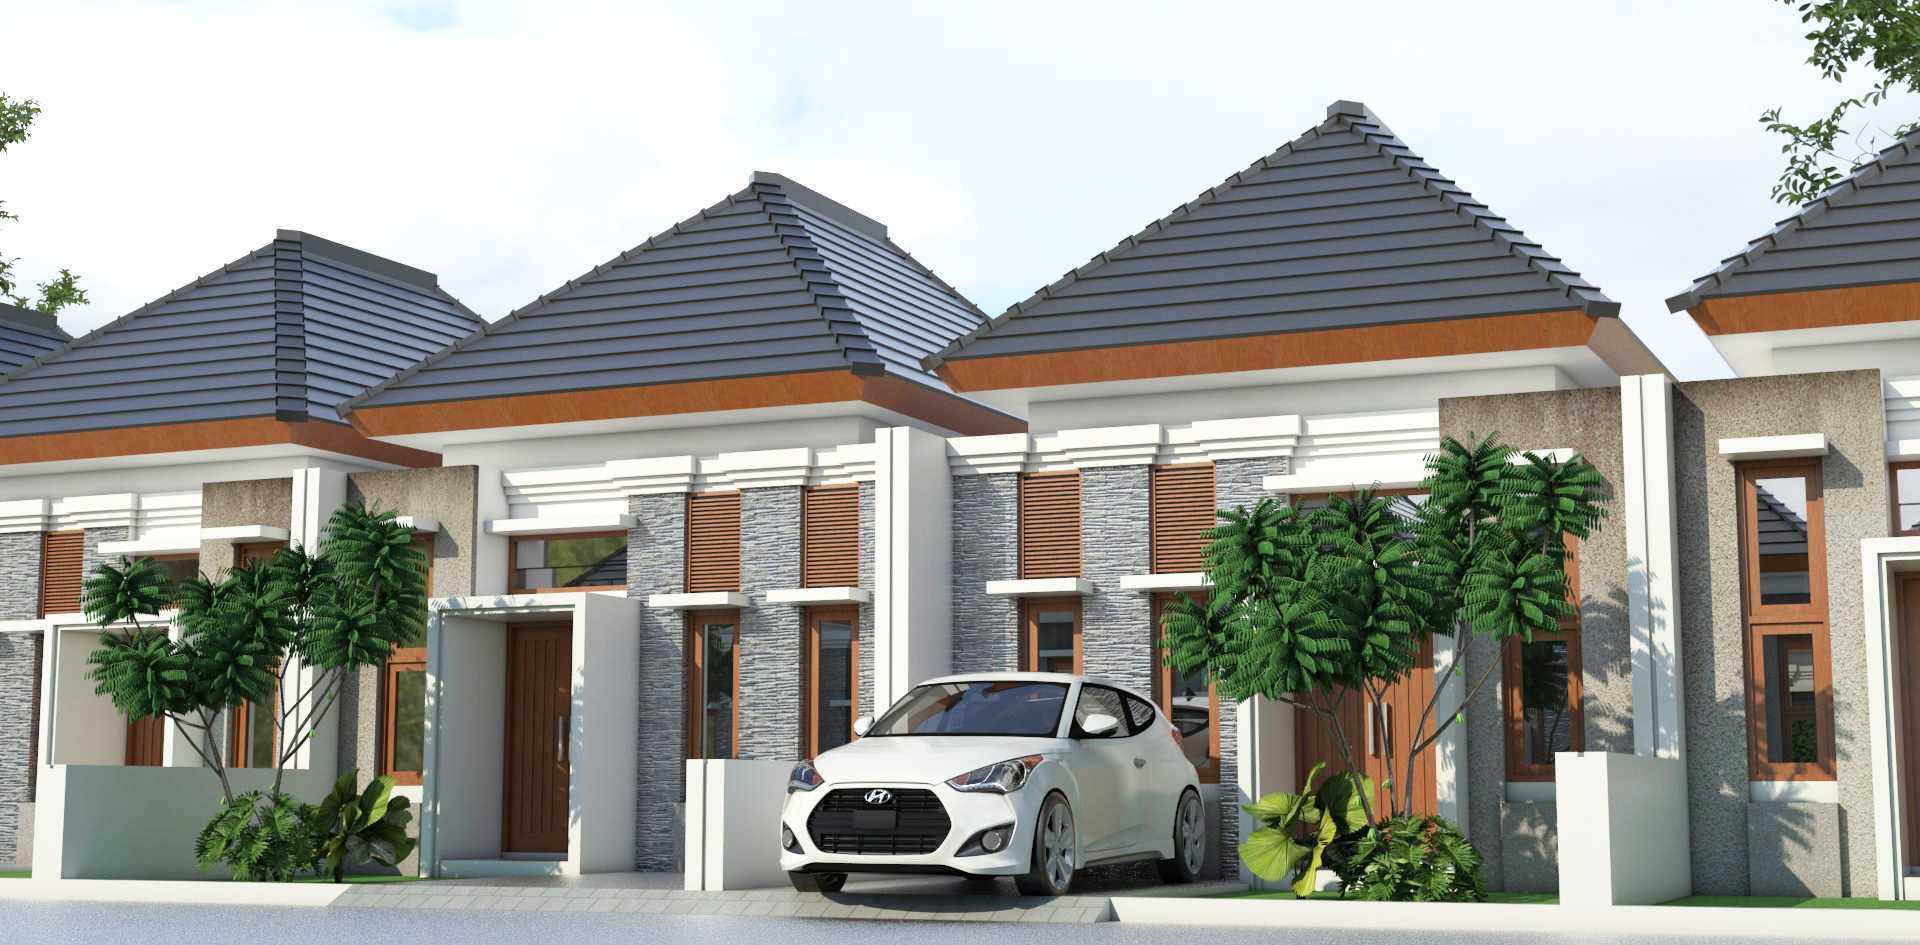 Mannor Architect Premium Cluster Modern Bogor, Jawa Barat, Indonesia Bogor, Jawa Barat, Indonesia Premium Cluster Modern Modern <P>Tampak Depan Rumah Dengan Model Fasade Bali Modern</p> 43882